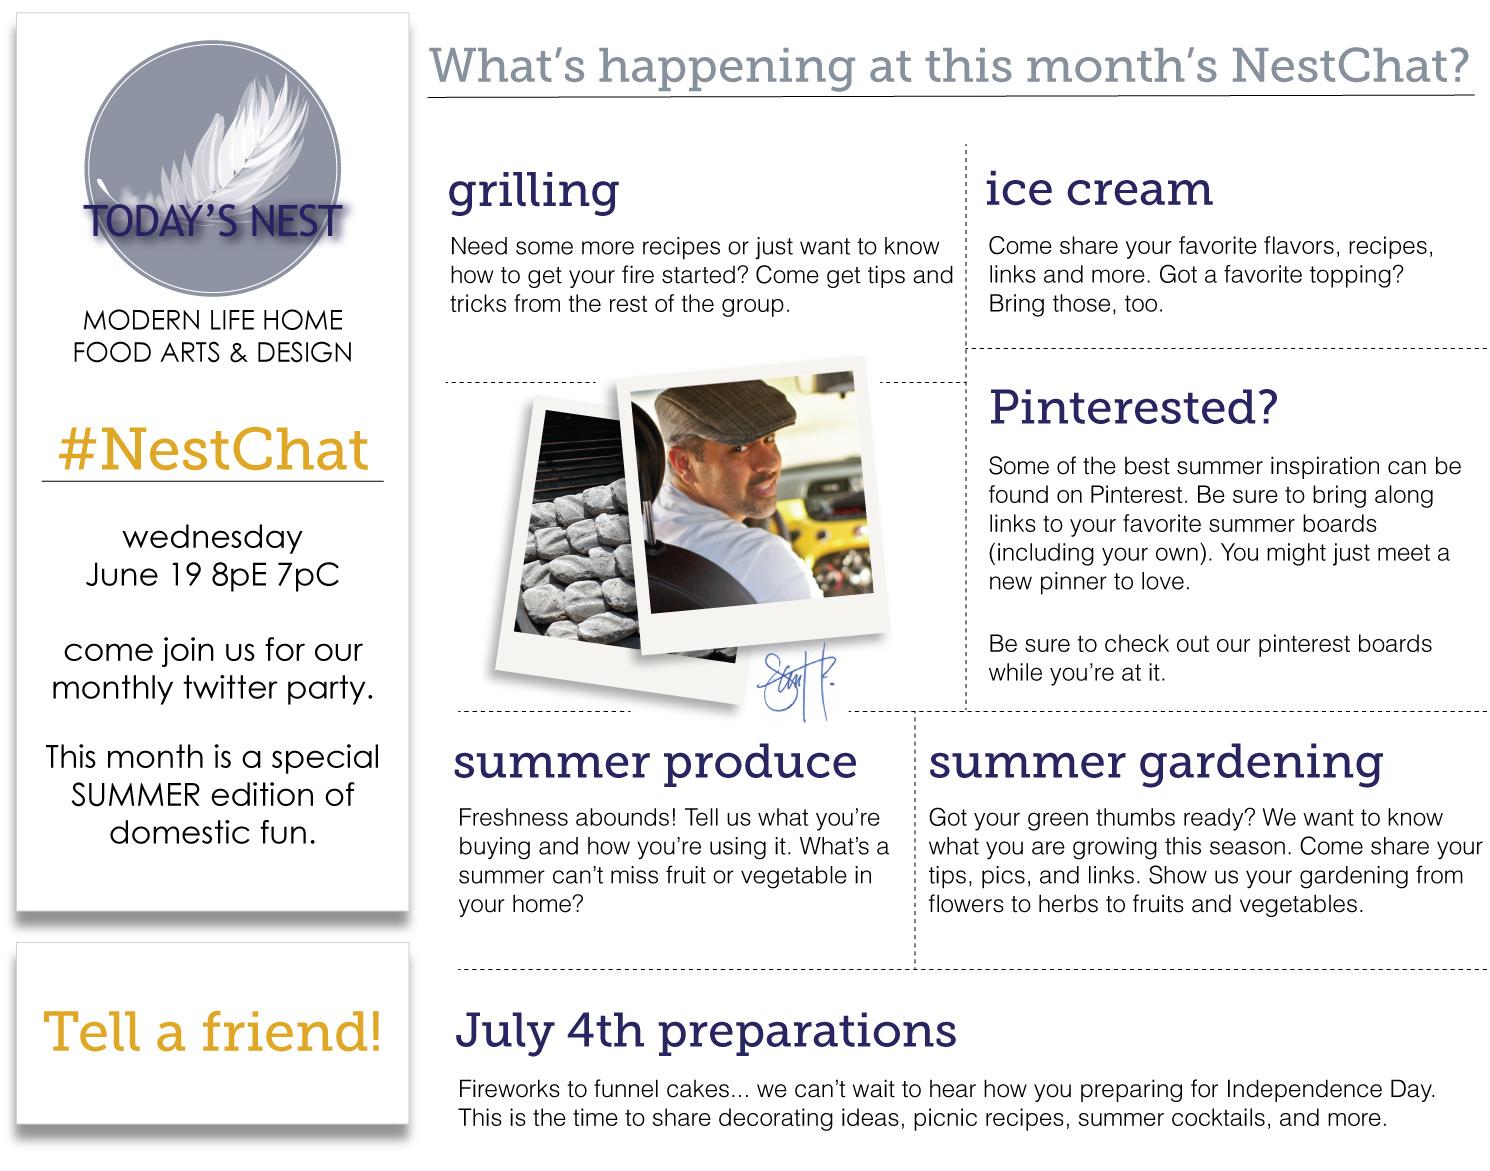 May13-NestChat-promo.jpg